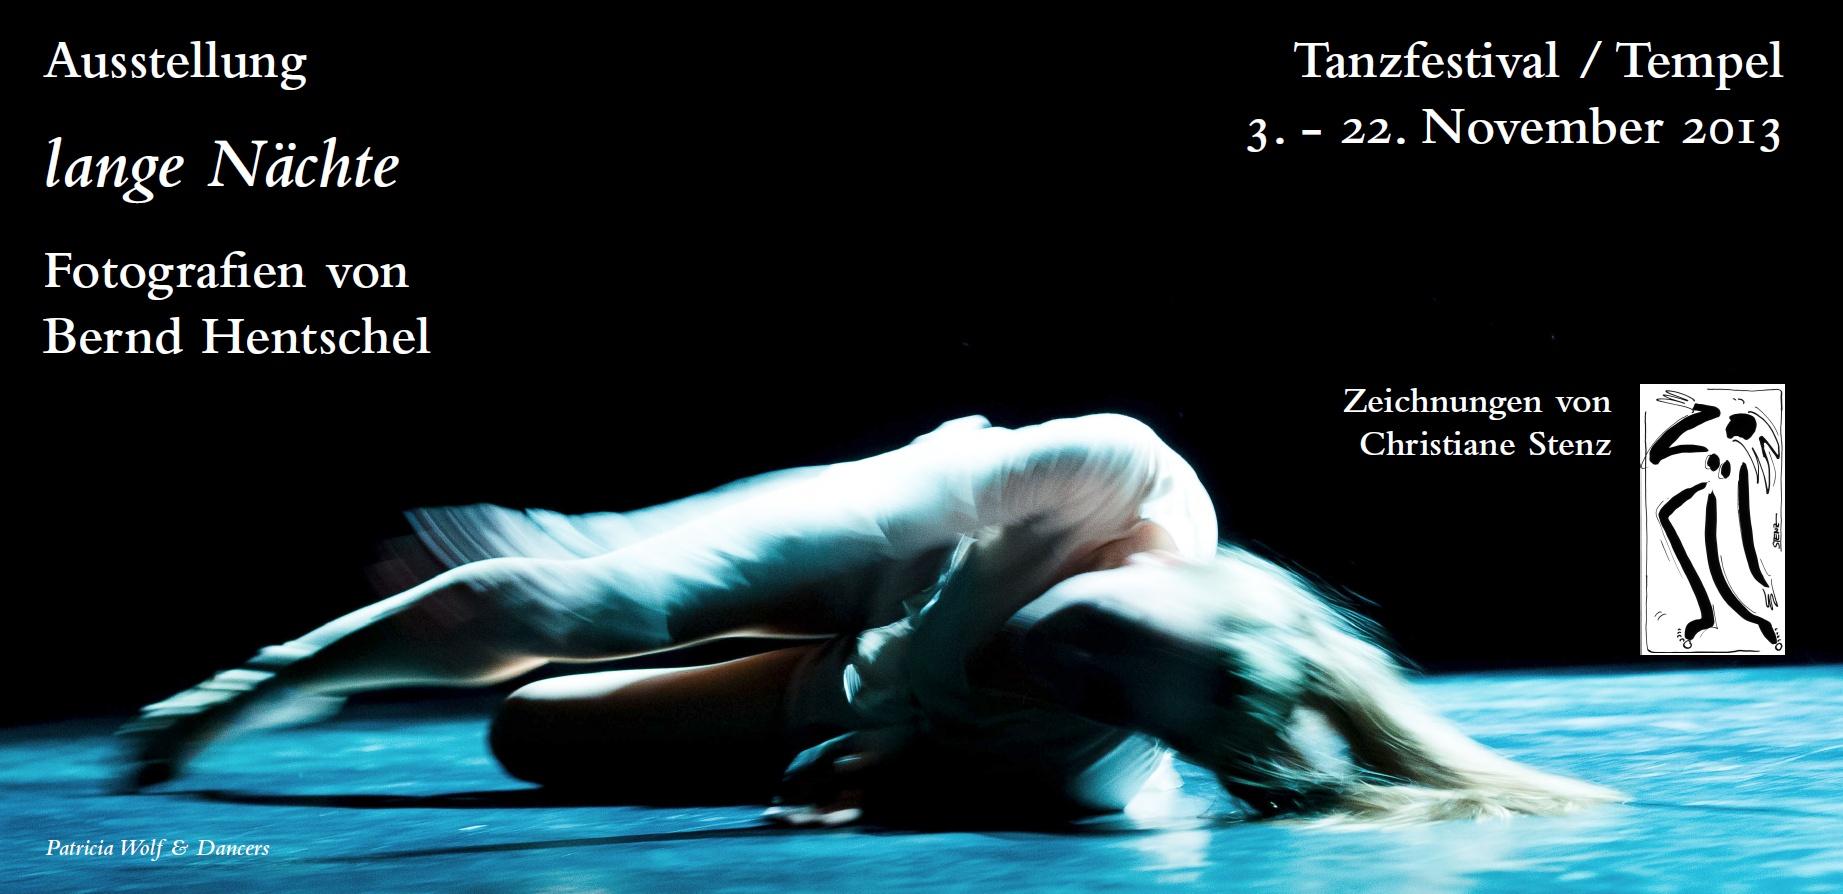 Tanzfestival Karlsruhe